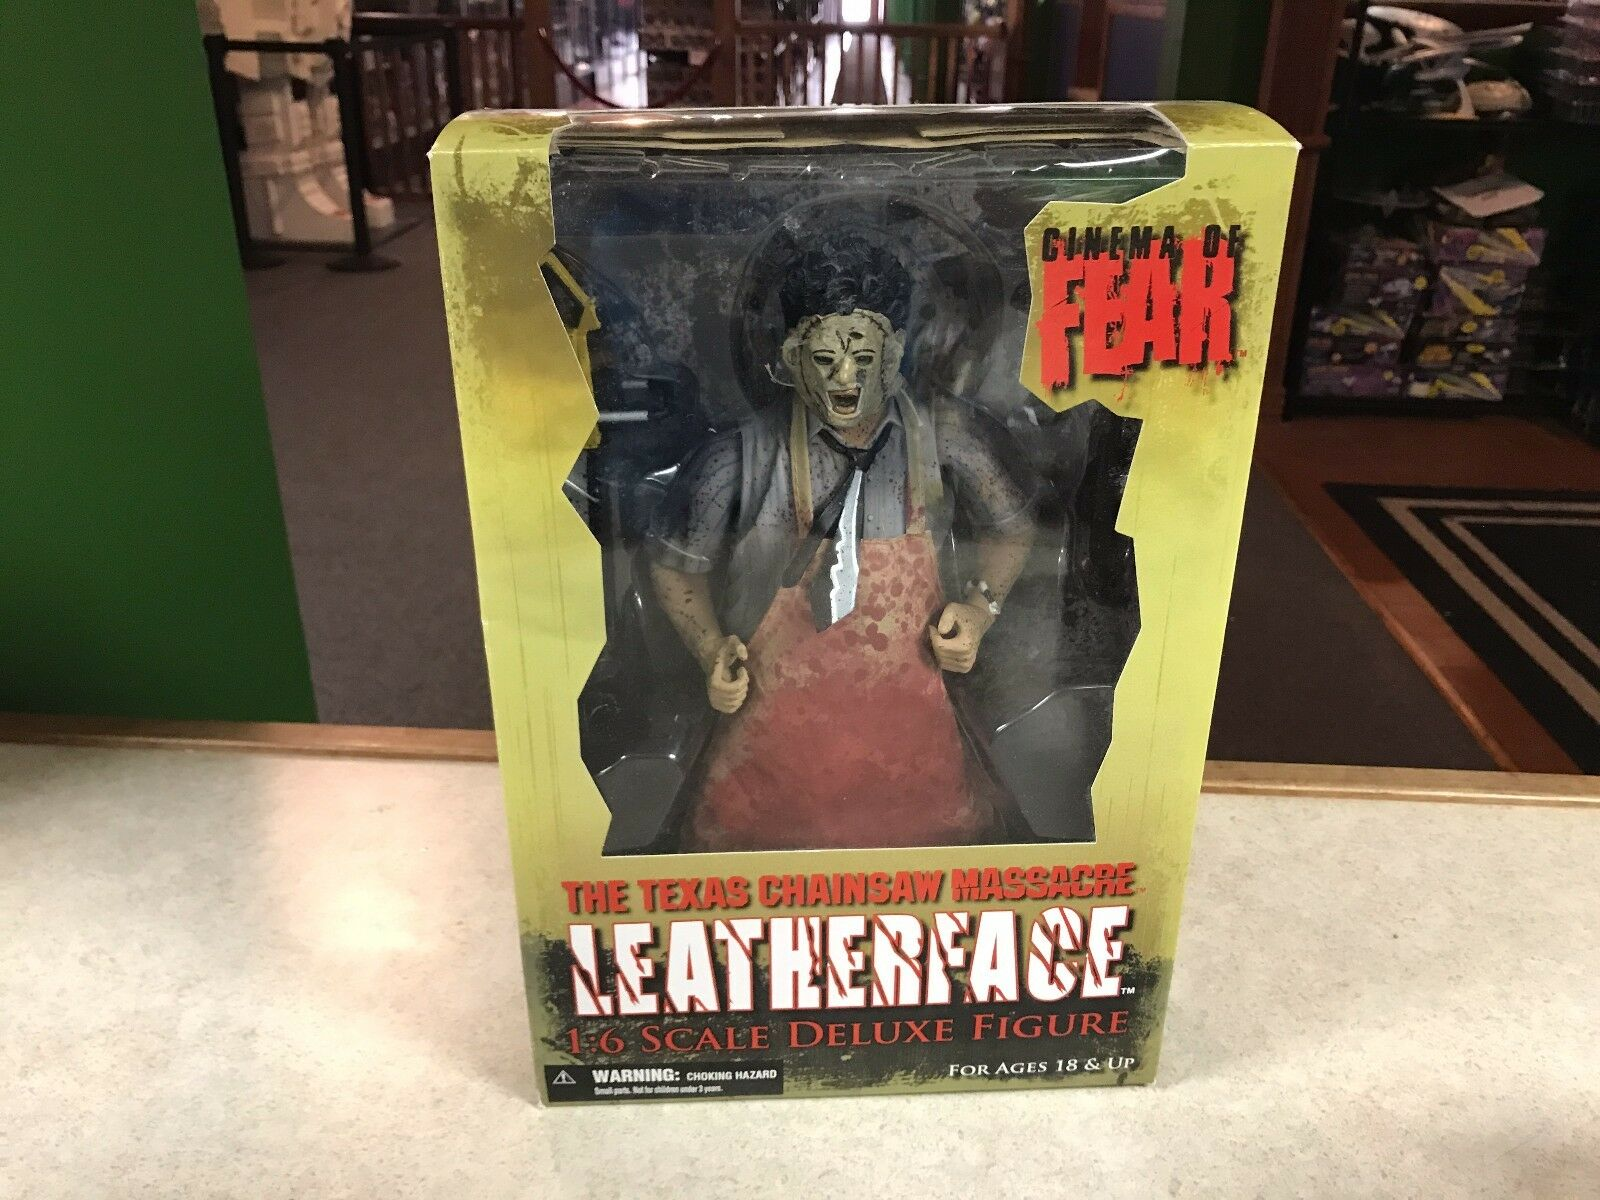 2010 Mezco Cinema of Fear Texas Chainsaw Massacre LEATHERFACE 12